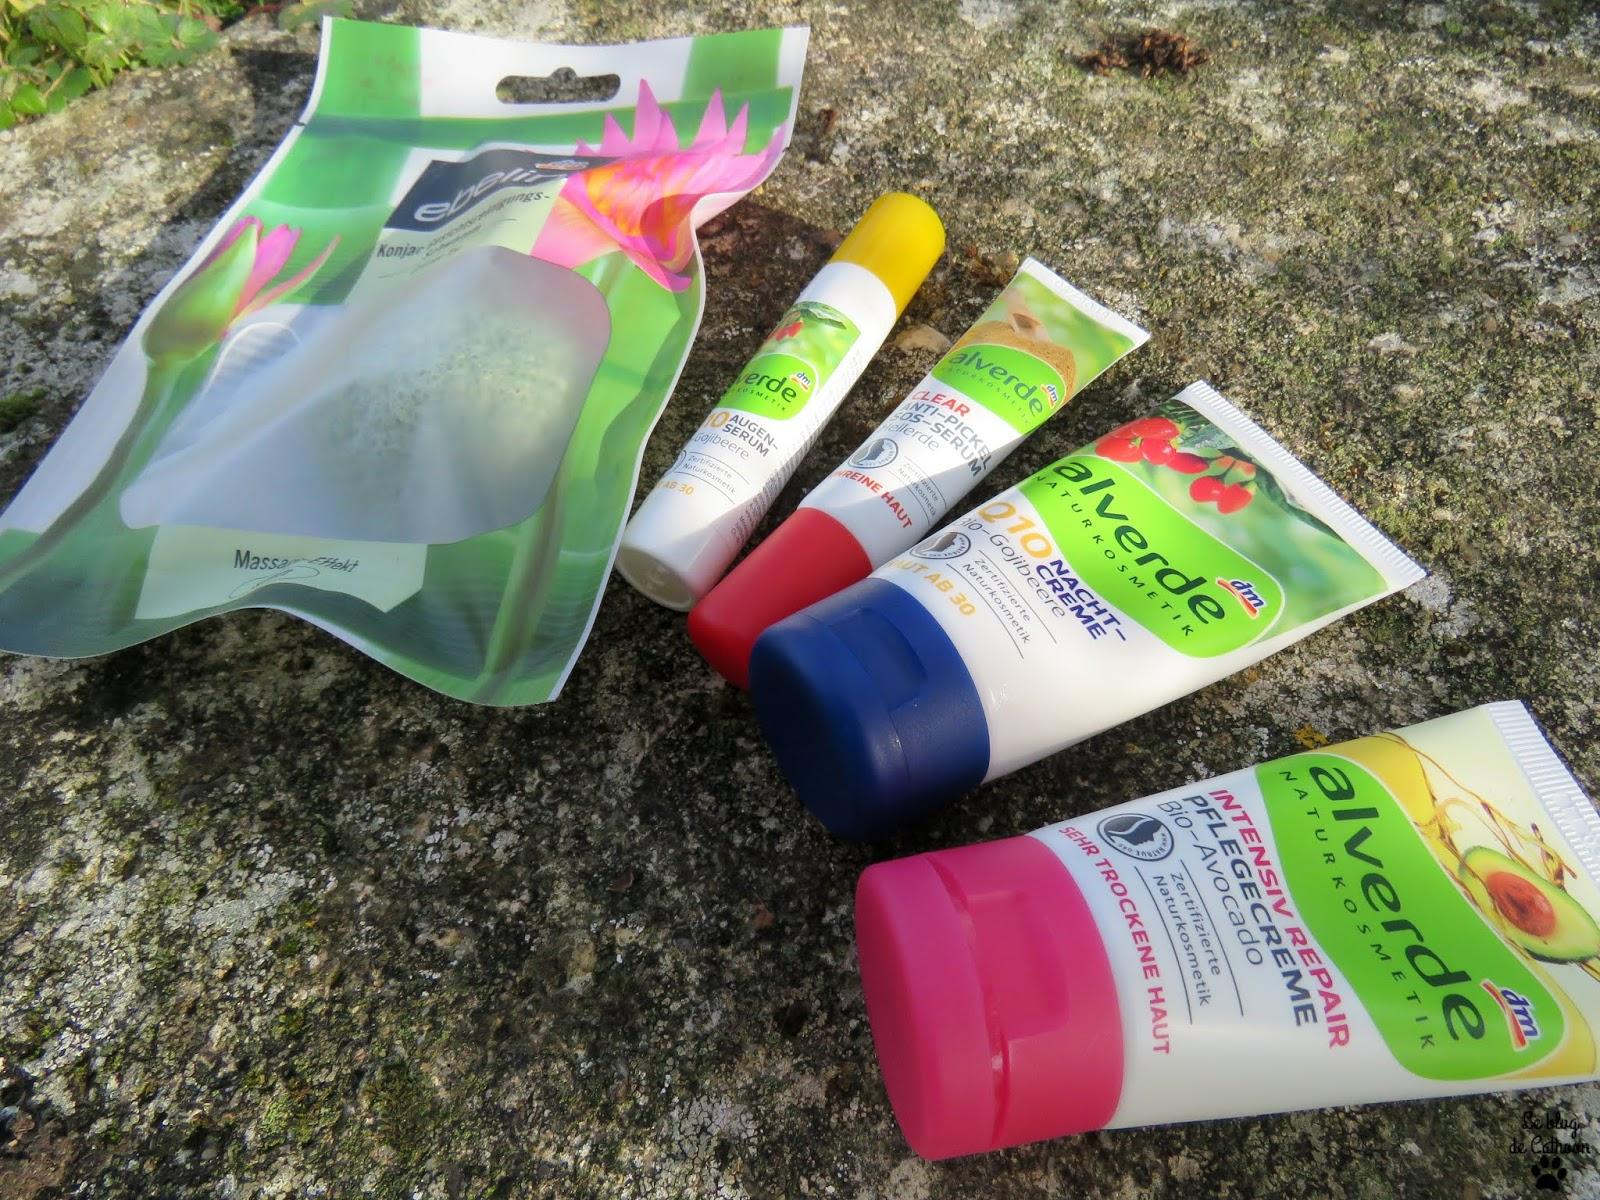 Alverde, gamme naturel & bio allemande